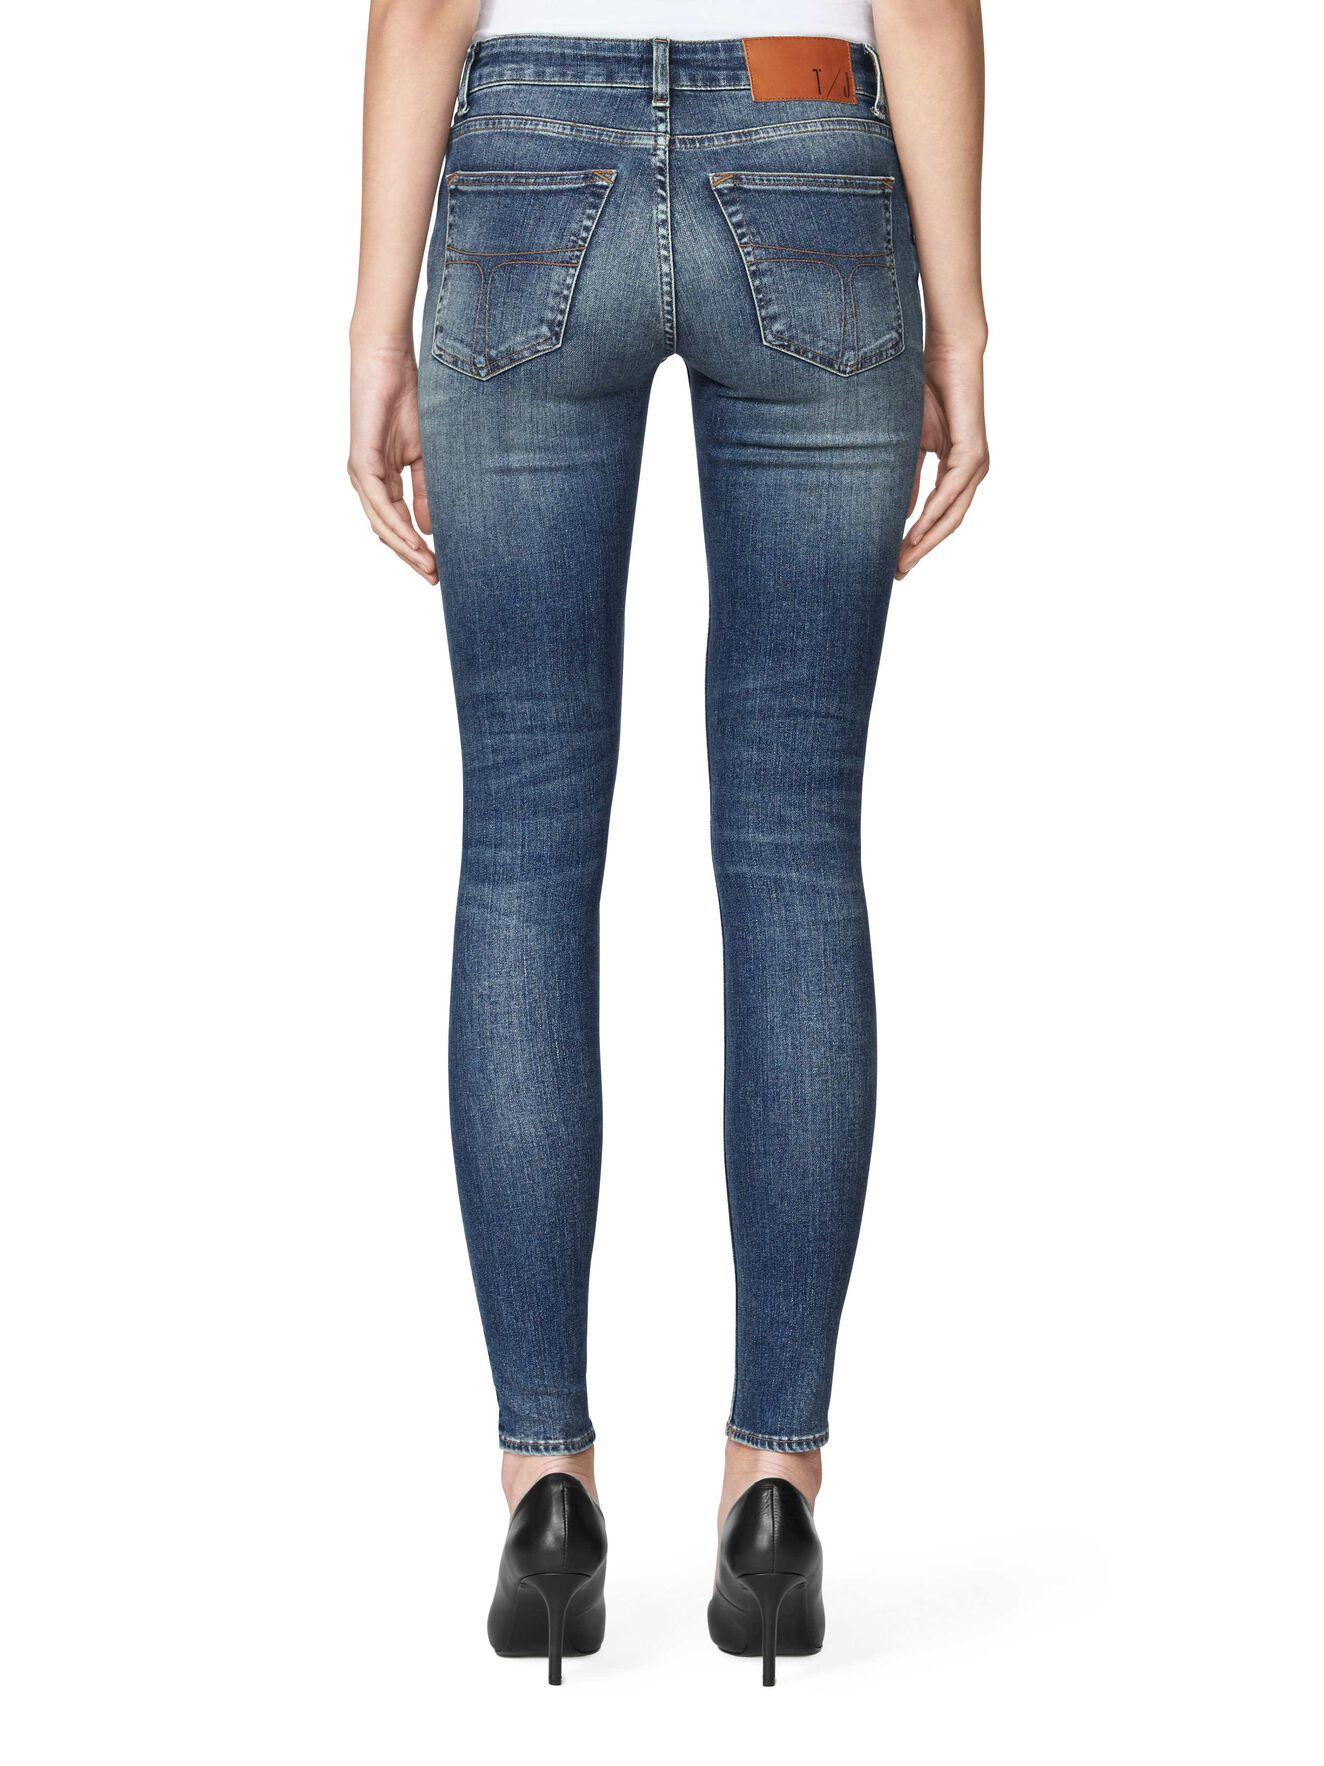 Slender jeans in Dust blue from Tiger of Sweden